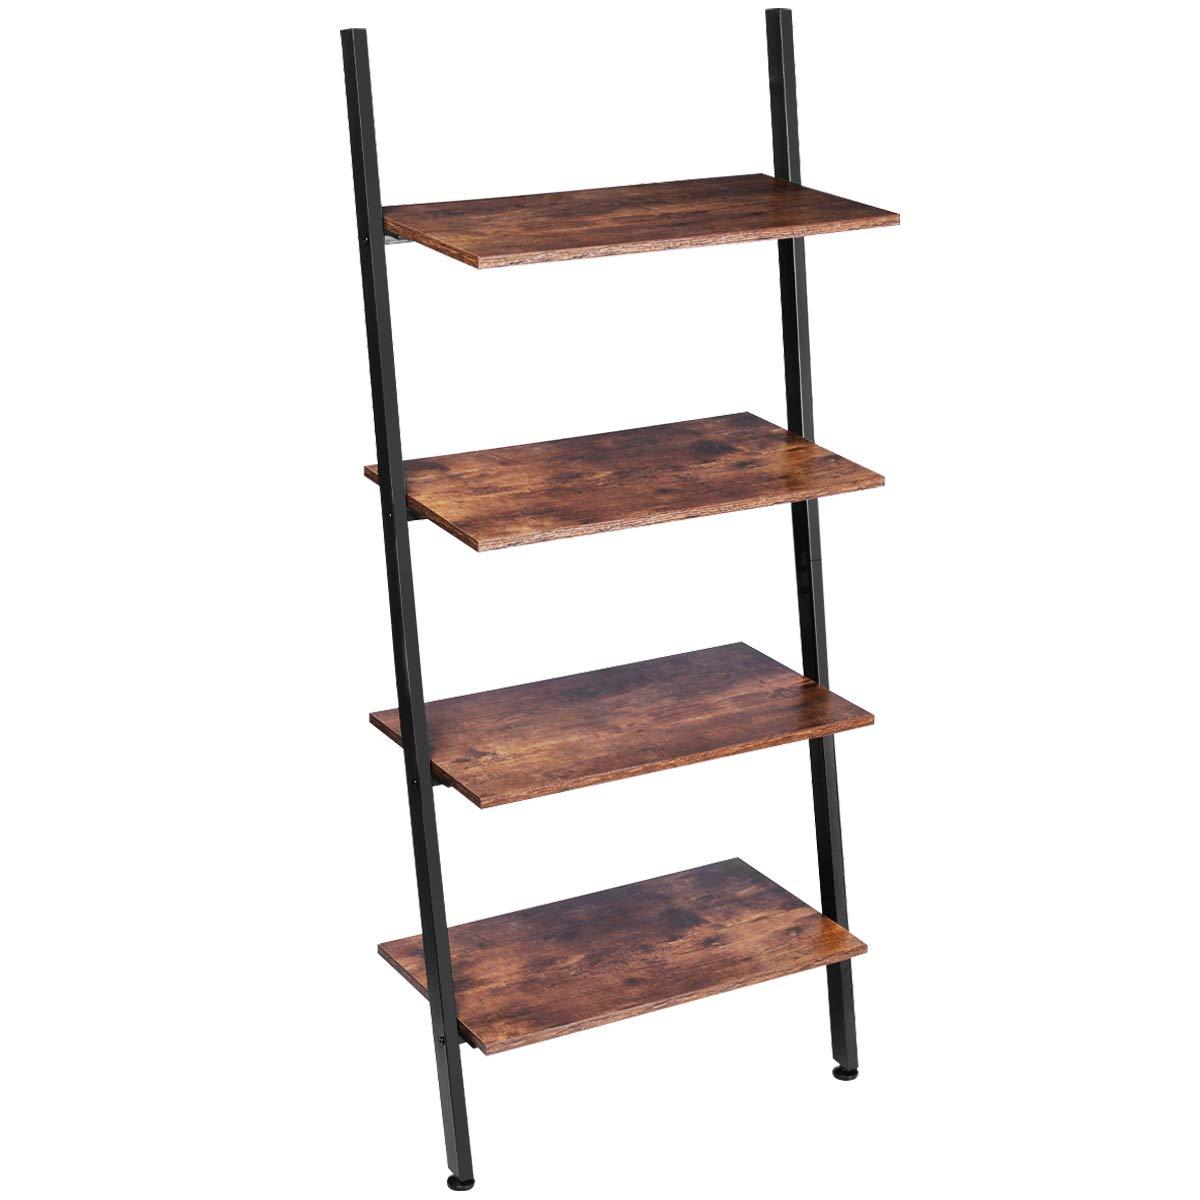 KINGSO Ladder Shelf 4-Tier Bookshelf Leaning Storage Rack Shelves for Living Room Kitchen Home Office Metal Frame Stable Sloping Industrial Ladder Shelfs Leaning Against The Wall Rustic Brown